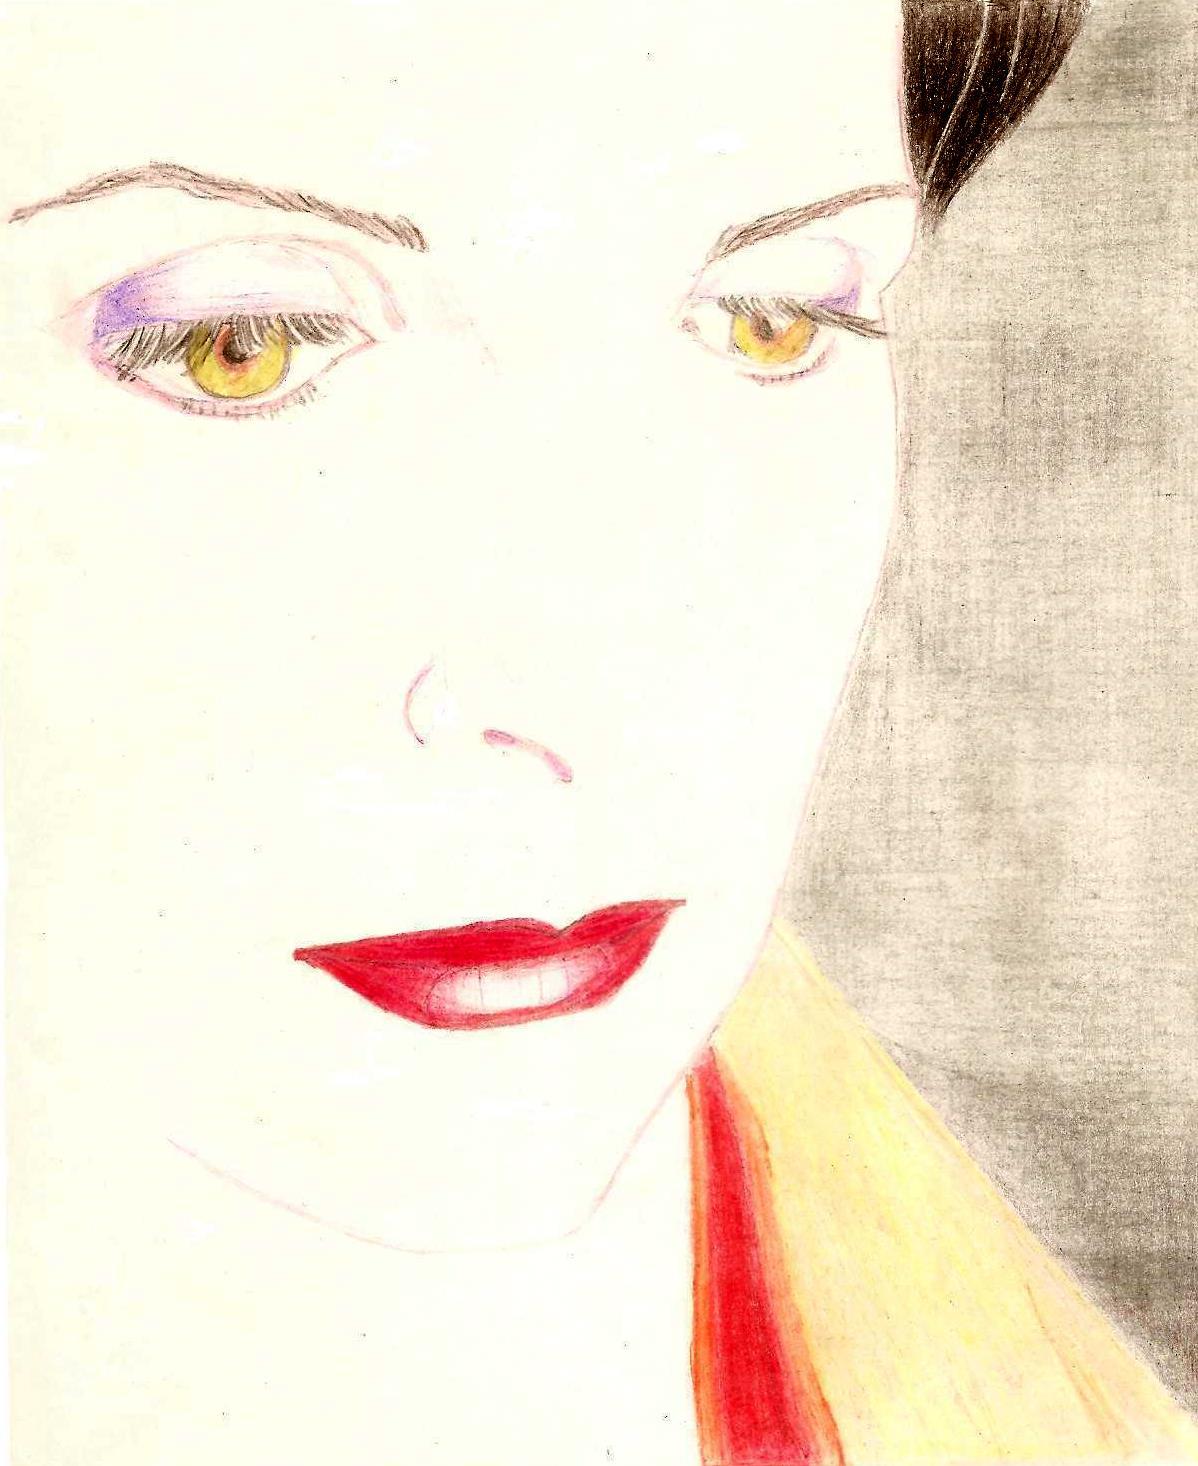 http://3.bp.blogspot.com/_YMdkeCqPdI8/TLxQIiJSo1I/AAAAAAAAAAg/isjenZPMnqQ/s1600/Enya+desenho.jpg